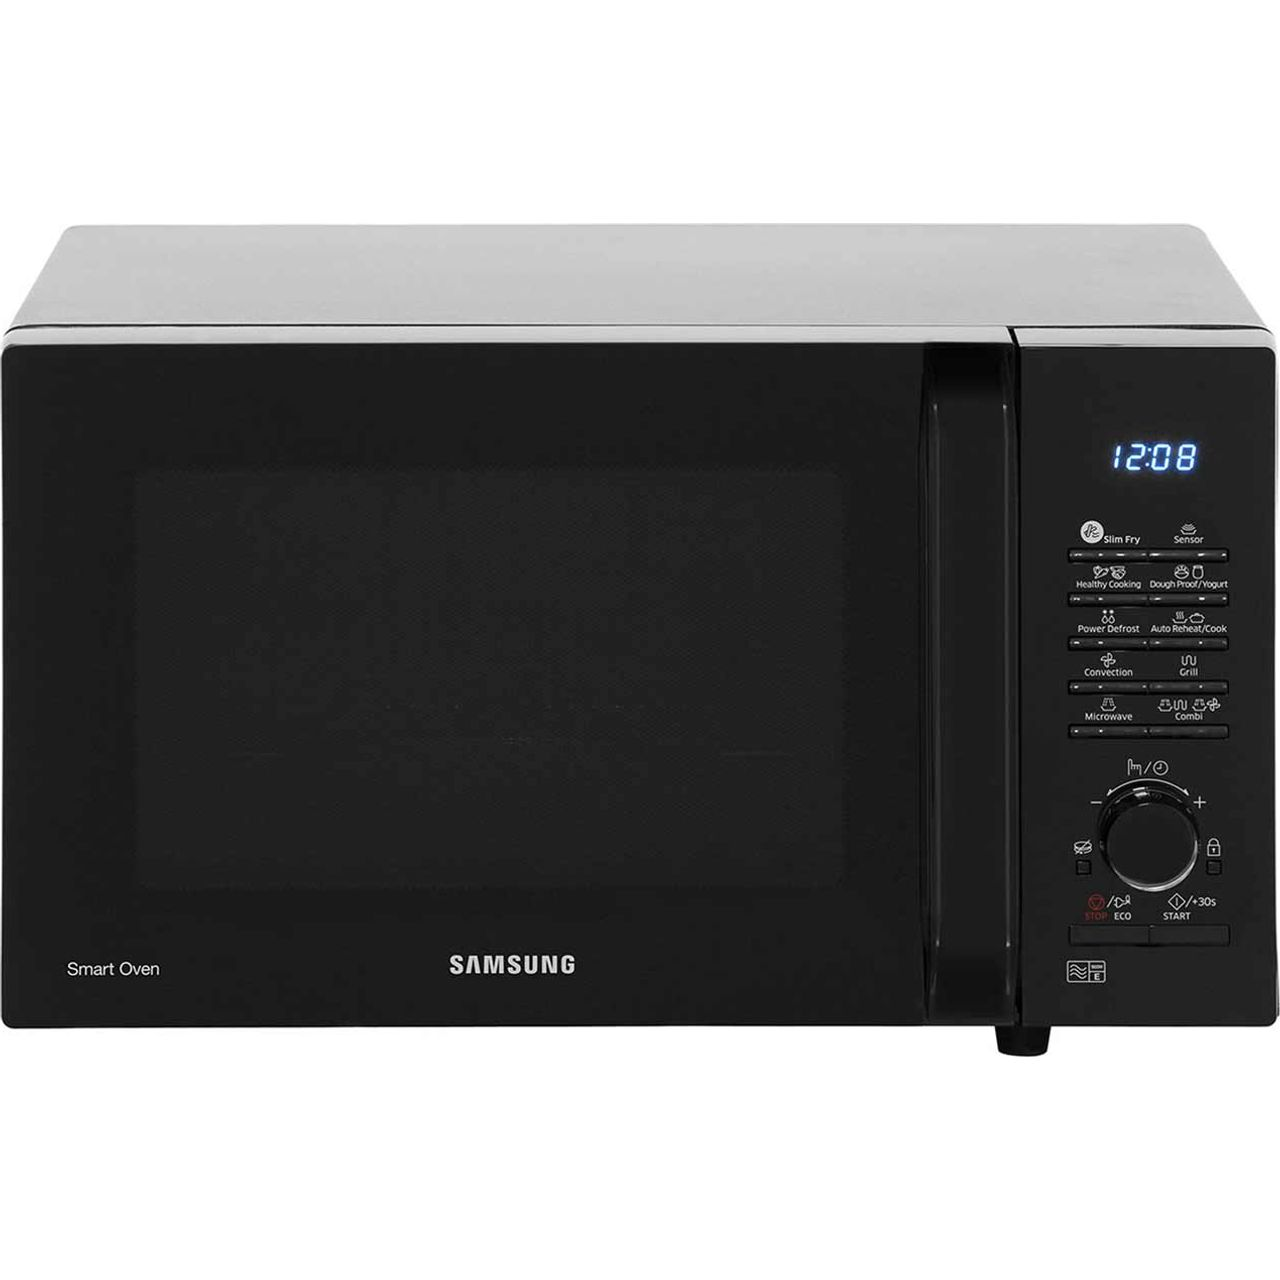 Samsung Smart Oven Microwave: Samsung MC28H5135CK Smart Oven 900 Watt Microwave Free